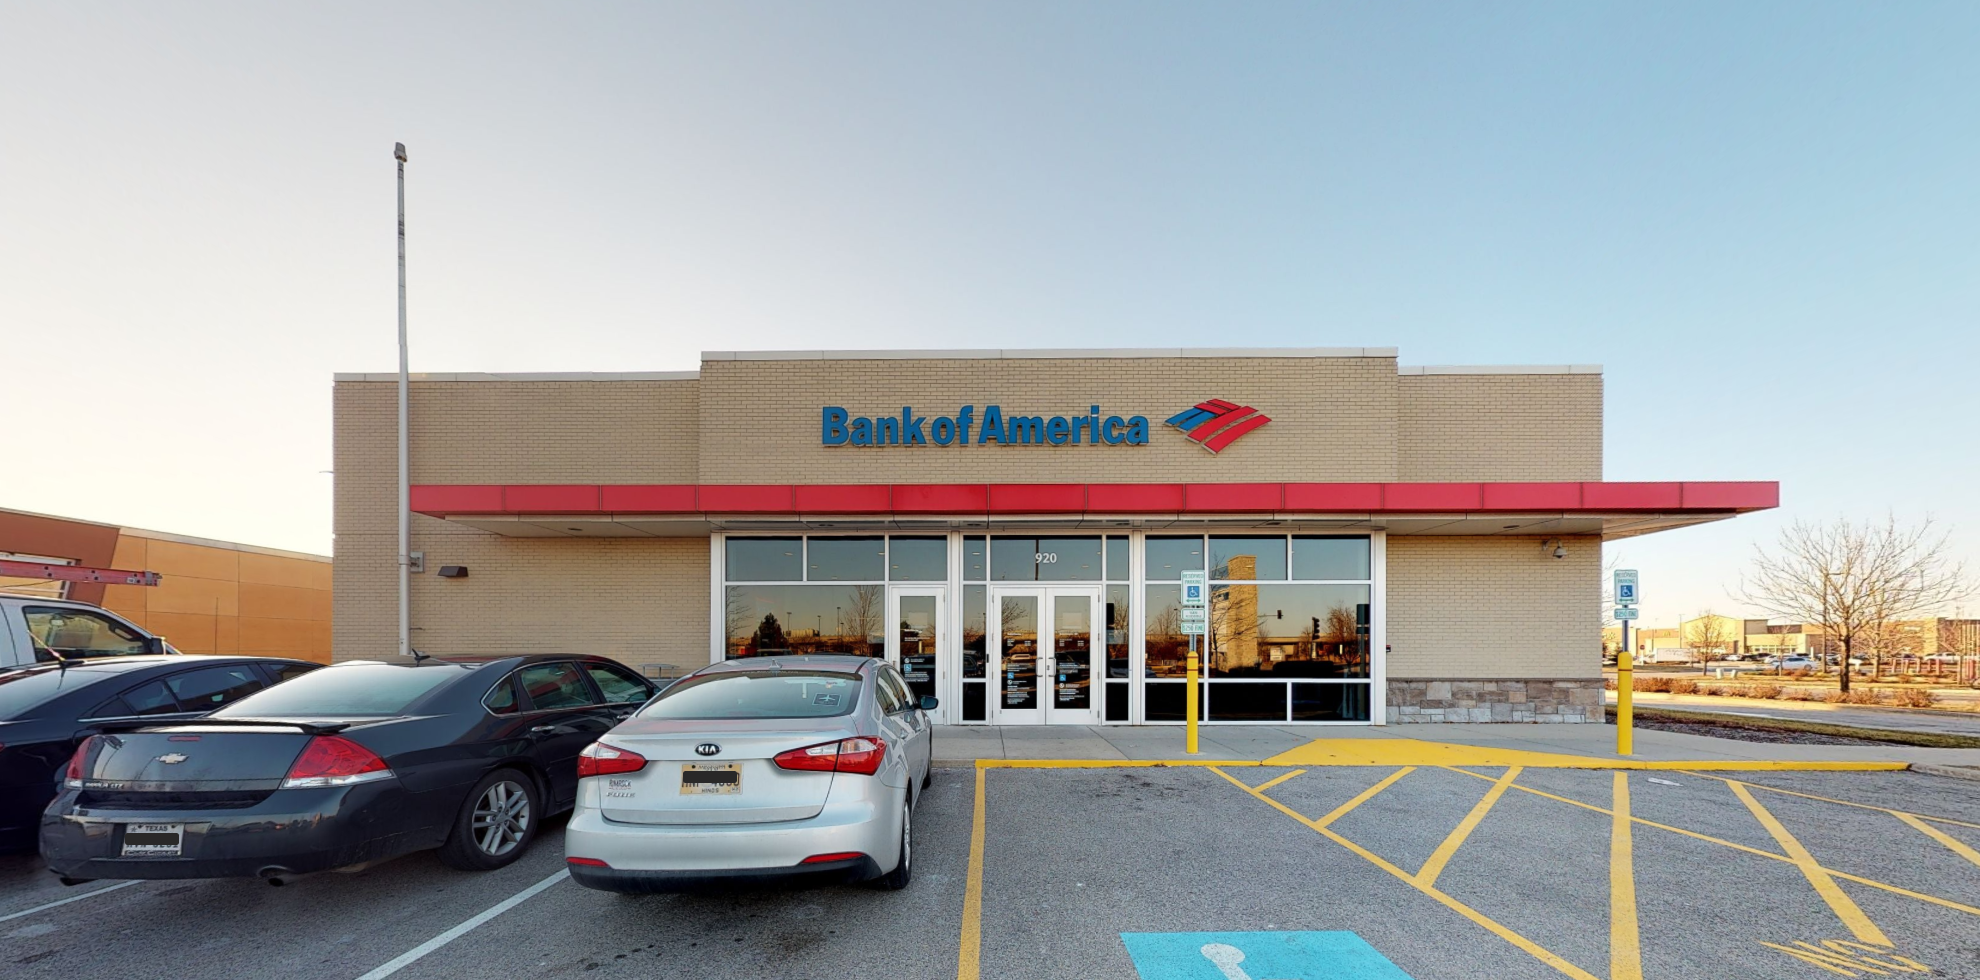 Bank of America financial center with drive-thru ATM | 920 S Waukegan Rd, Waukegan, IL 60085